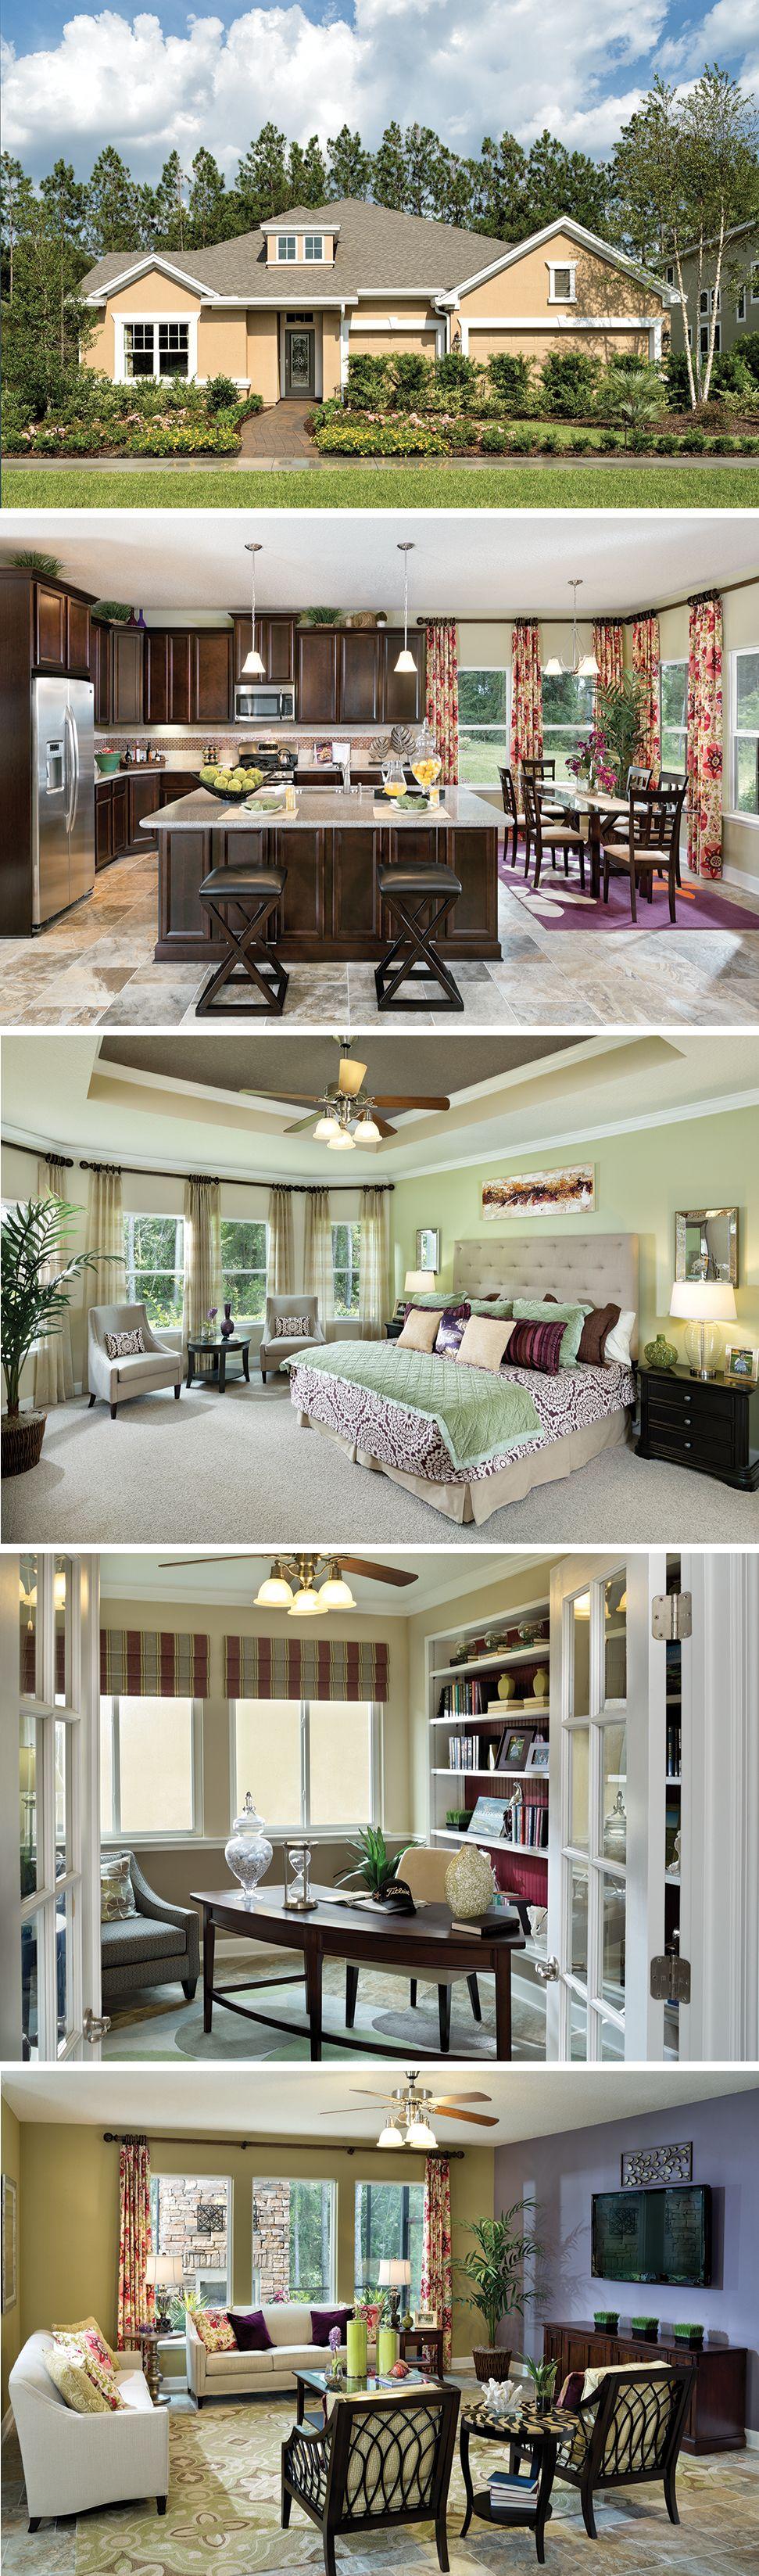 http://www.davidweekleyhomes.com/new-homes/fl/jacksonville/ponte ...